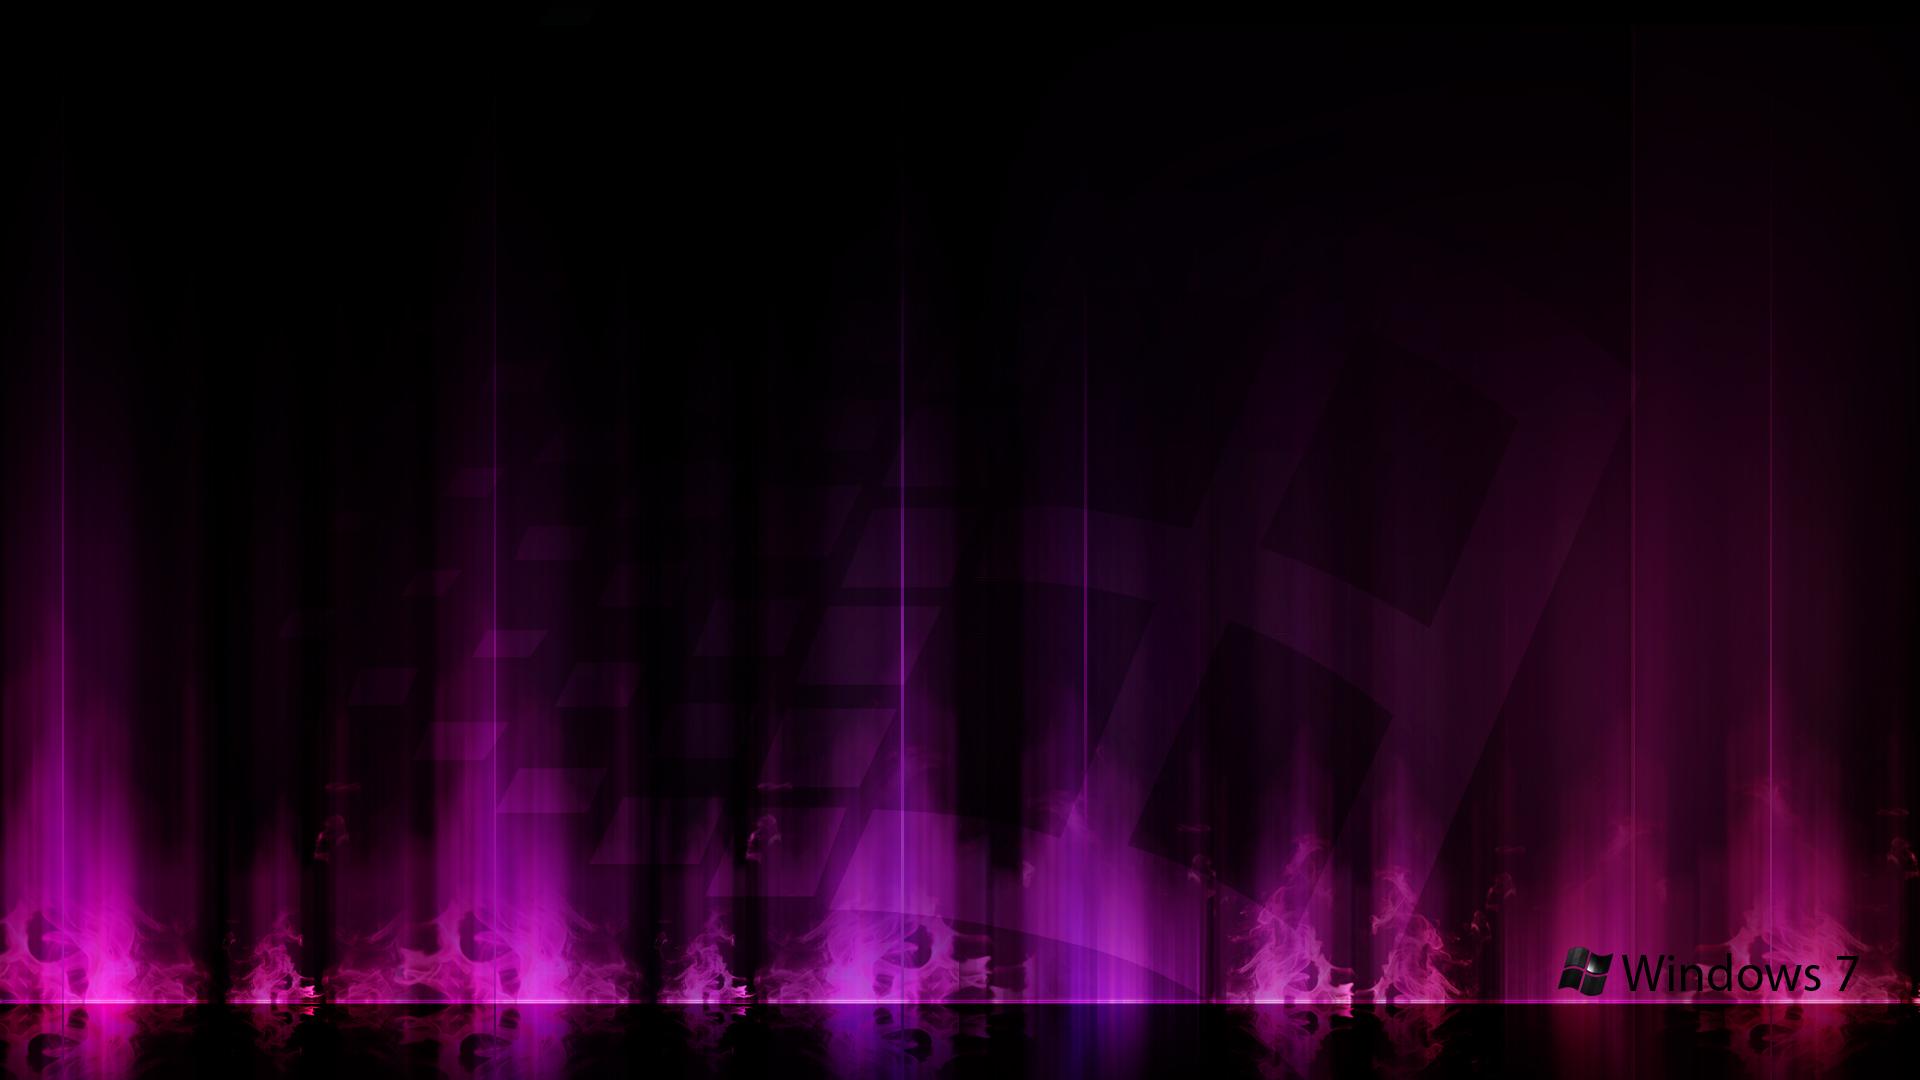 Windows 7 Purple Aurora Wallpapers HD Wallpapers 1920x1080